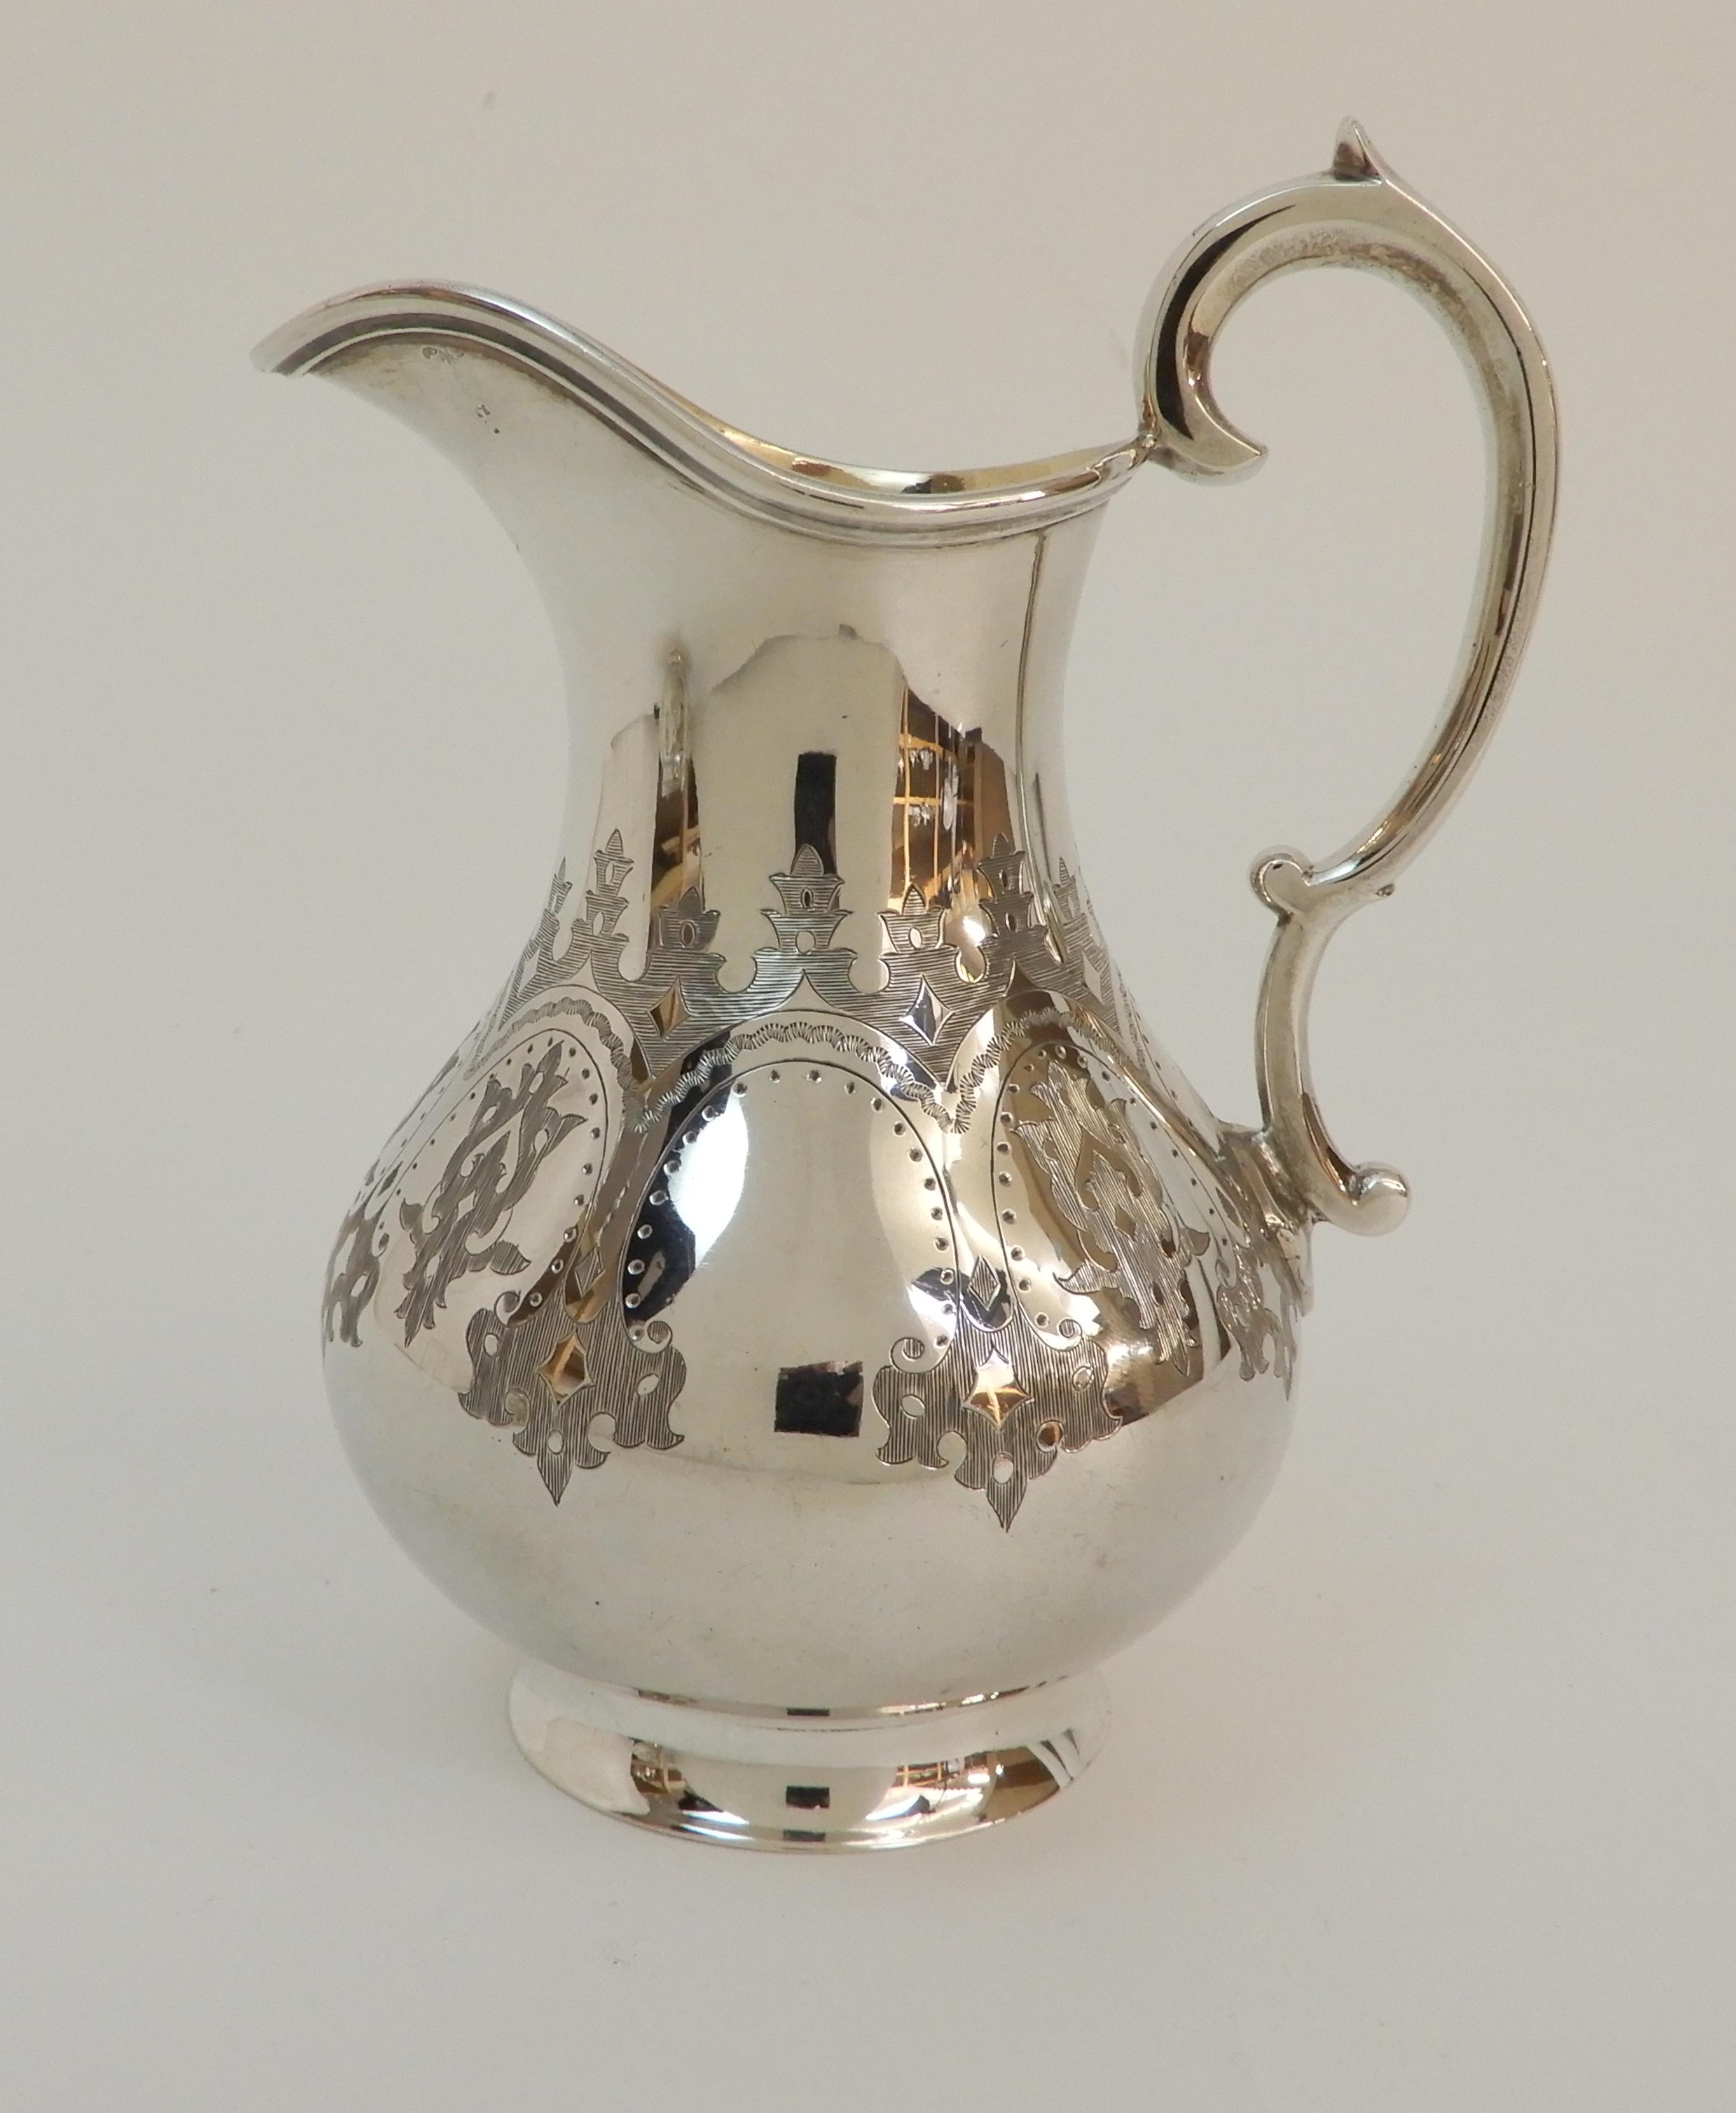 Lot 154 - A MATCHED VICTORIAN SILVER THREE PIECE TEA SERVICE by Robert Harper, London 1867, the cream jug